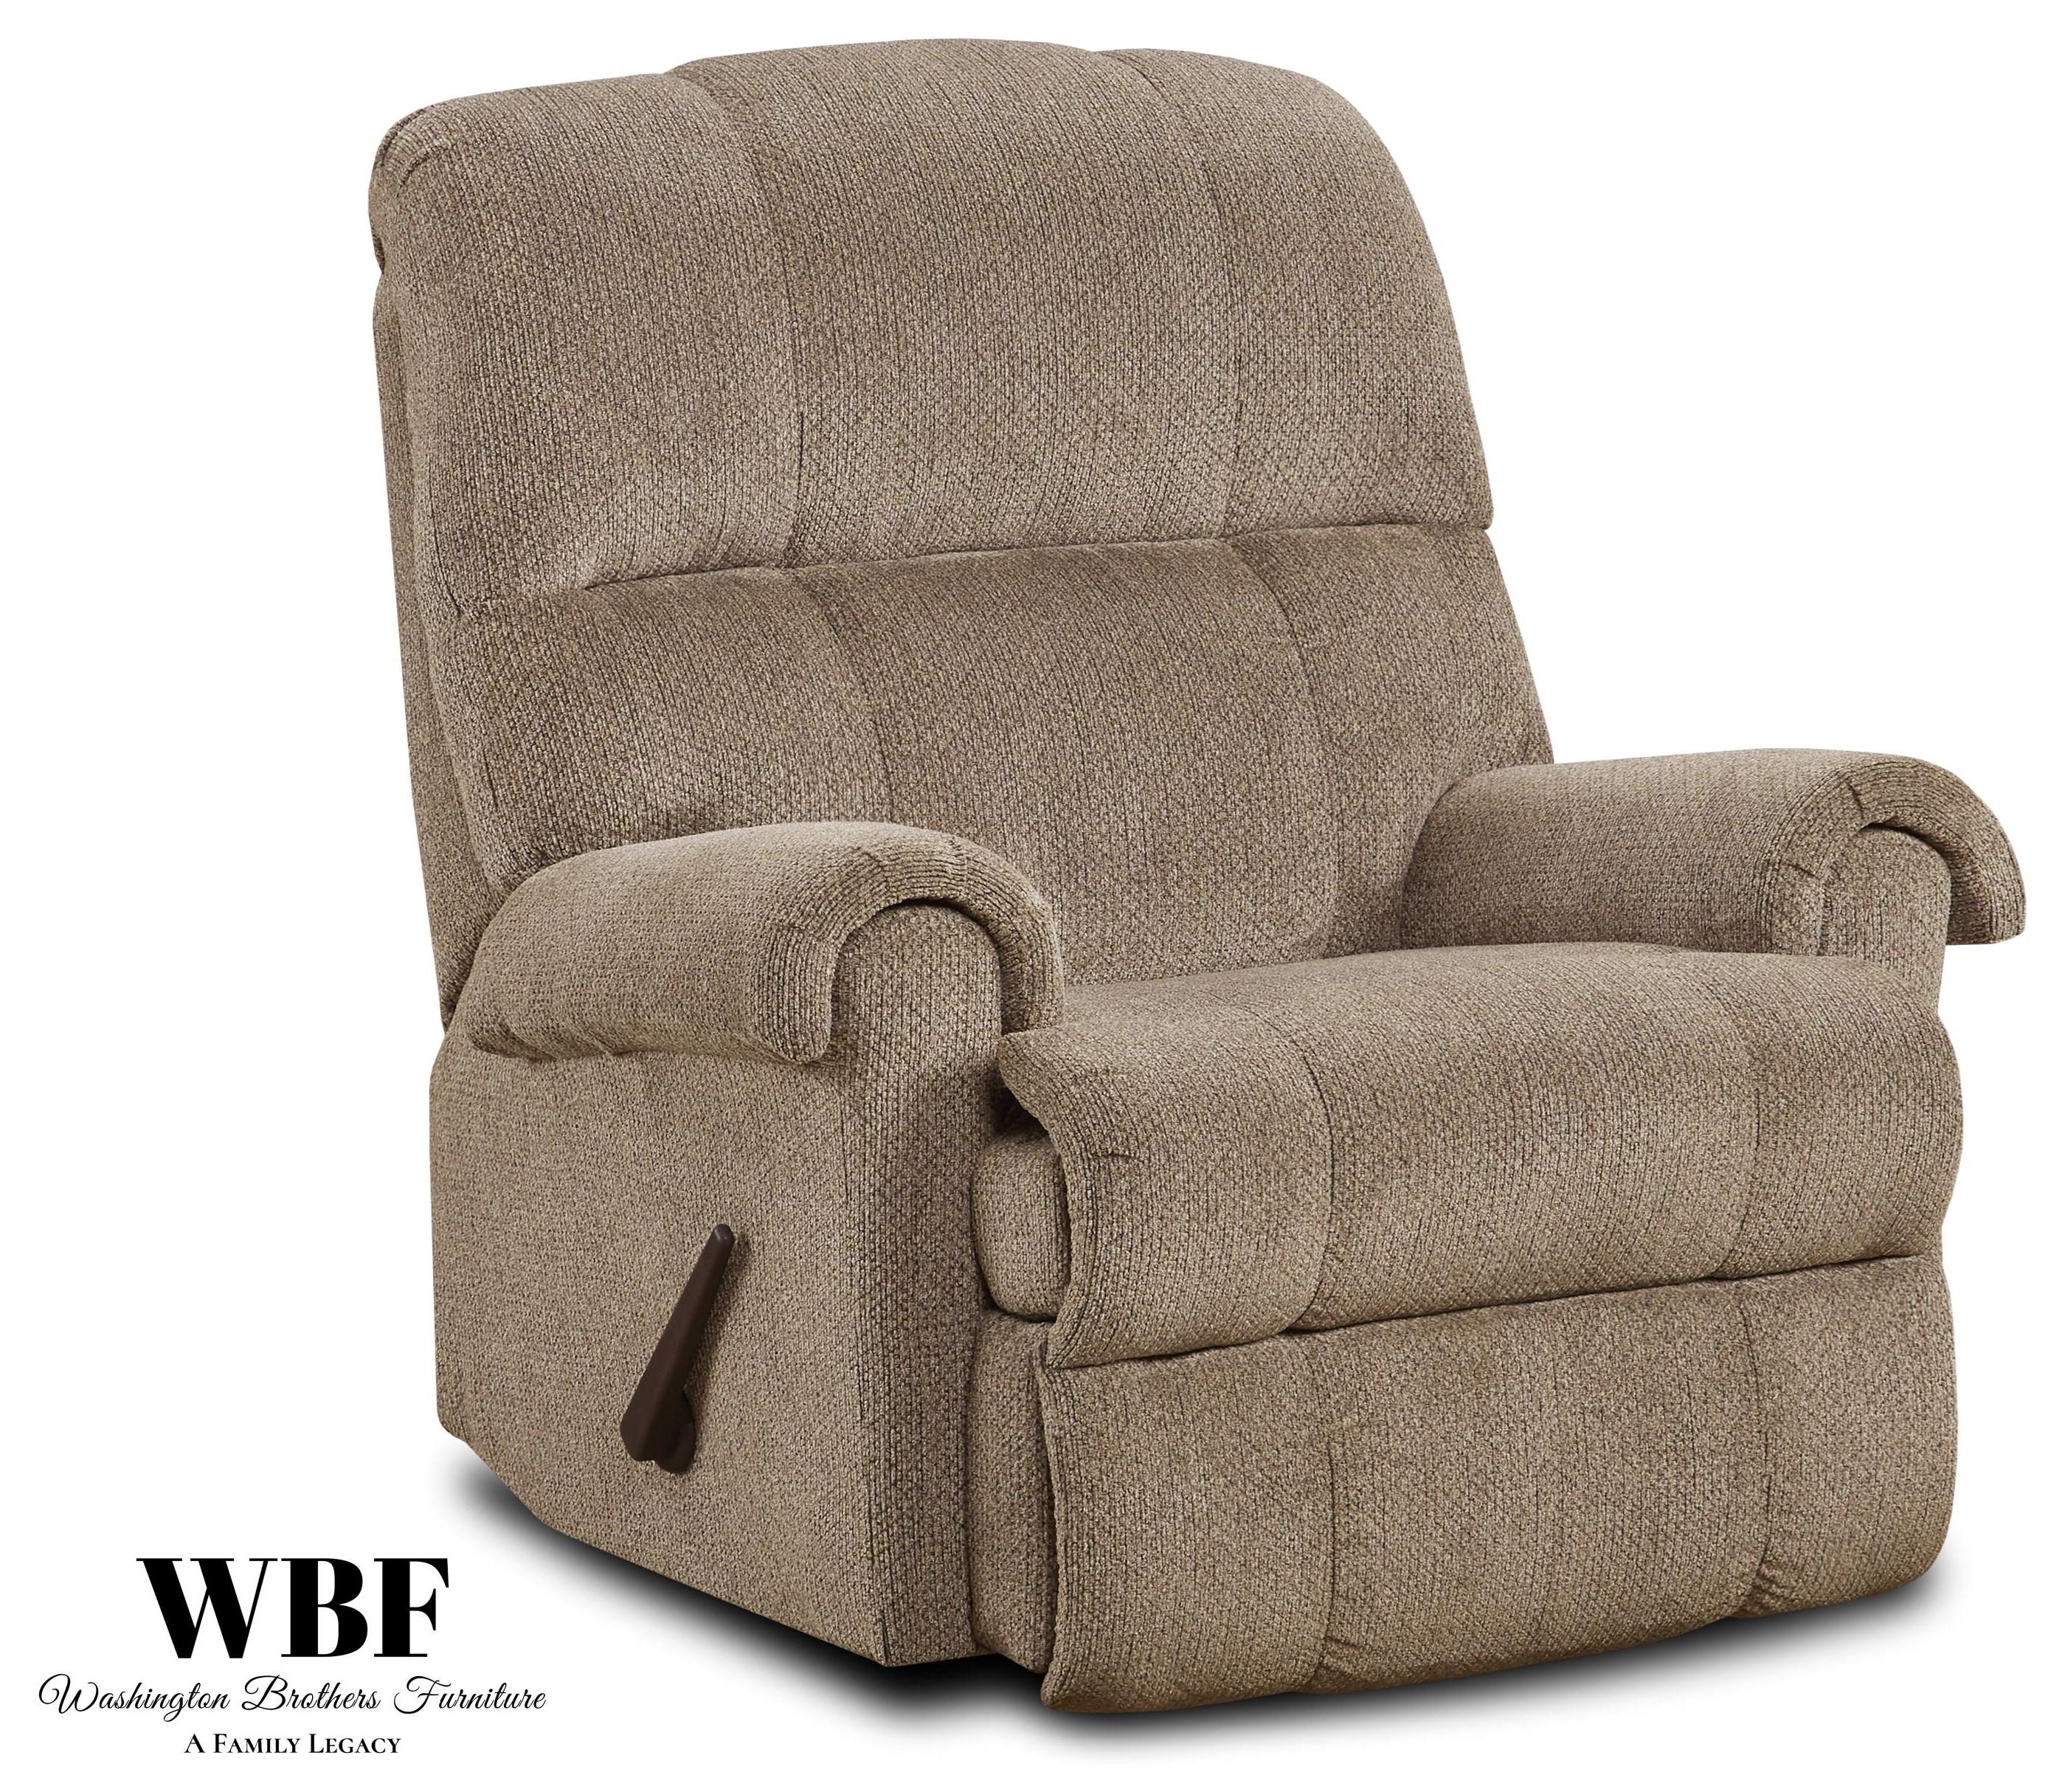 9010 Recliners Recliner by Washington Brothers Furniture at Furniture Fair - North Carolina